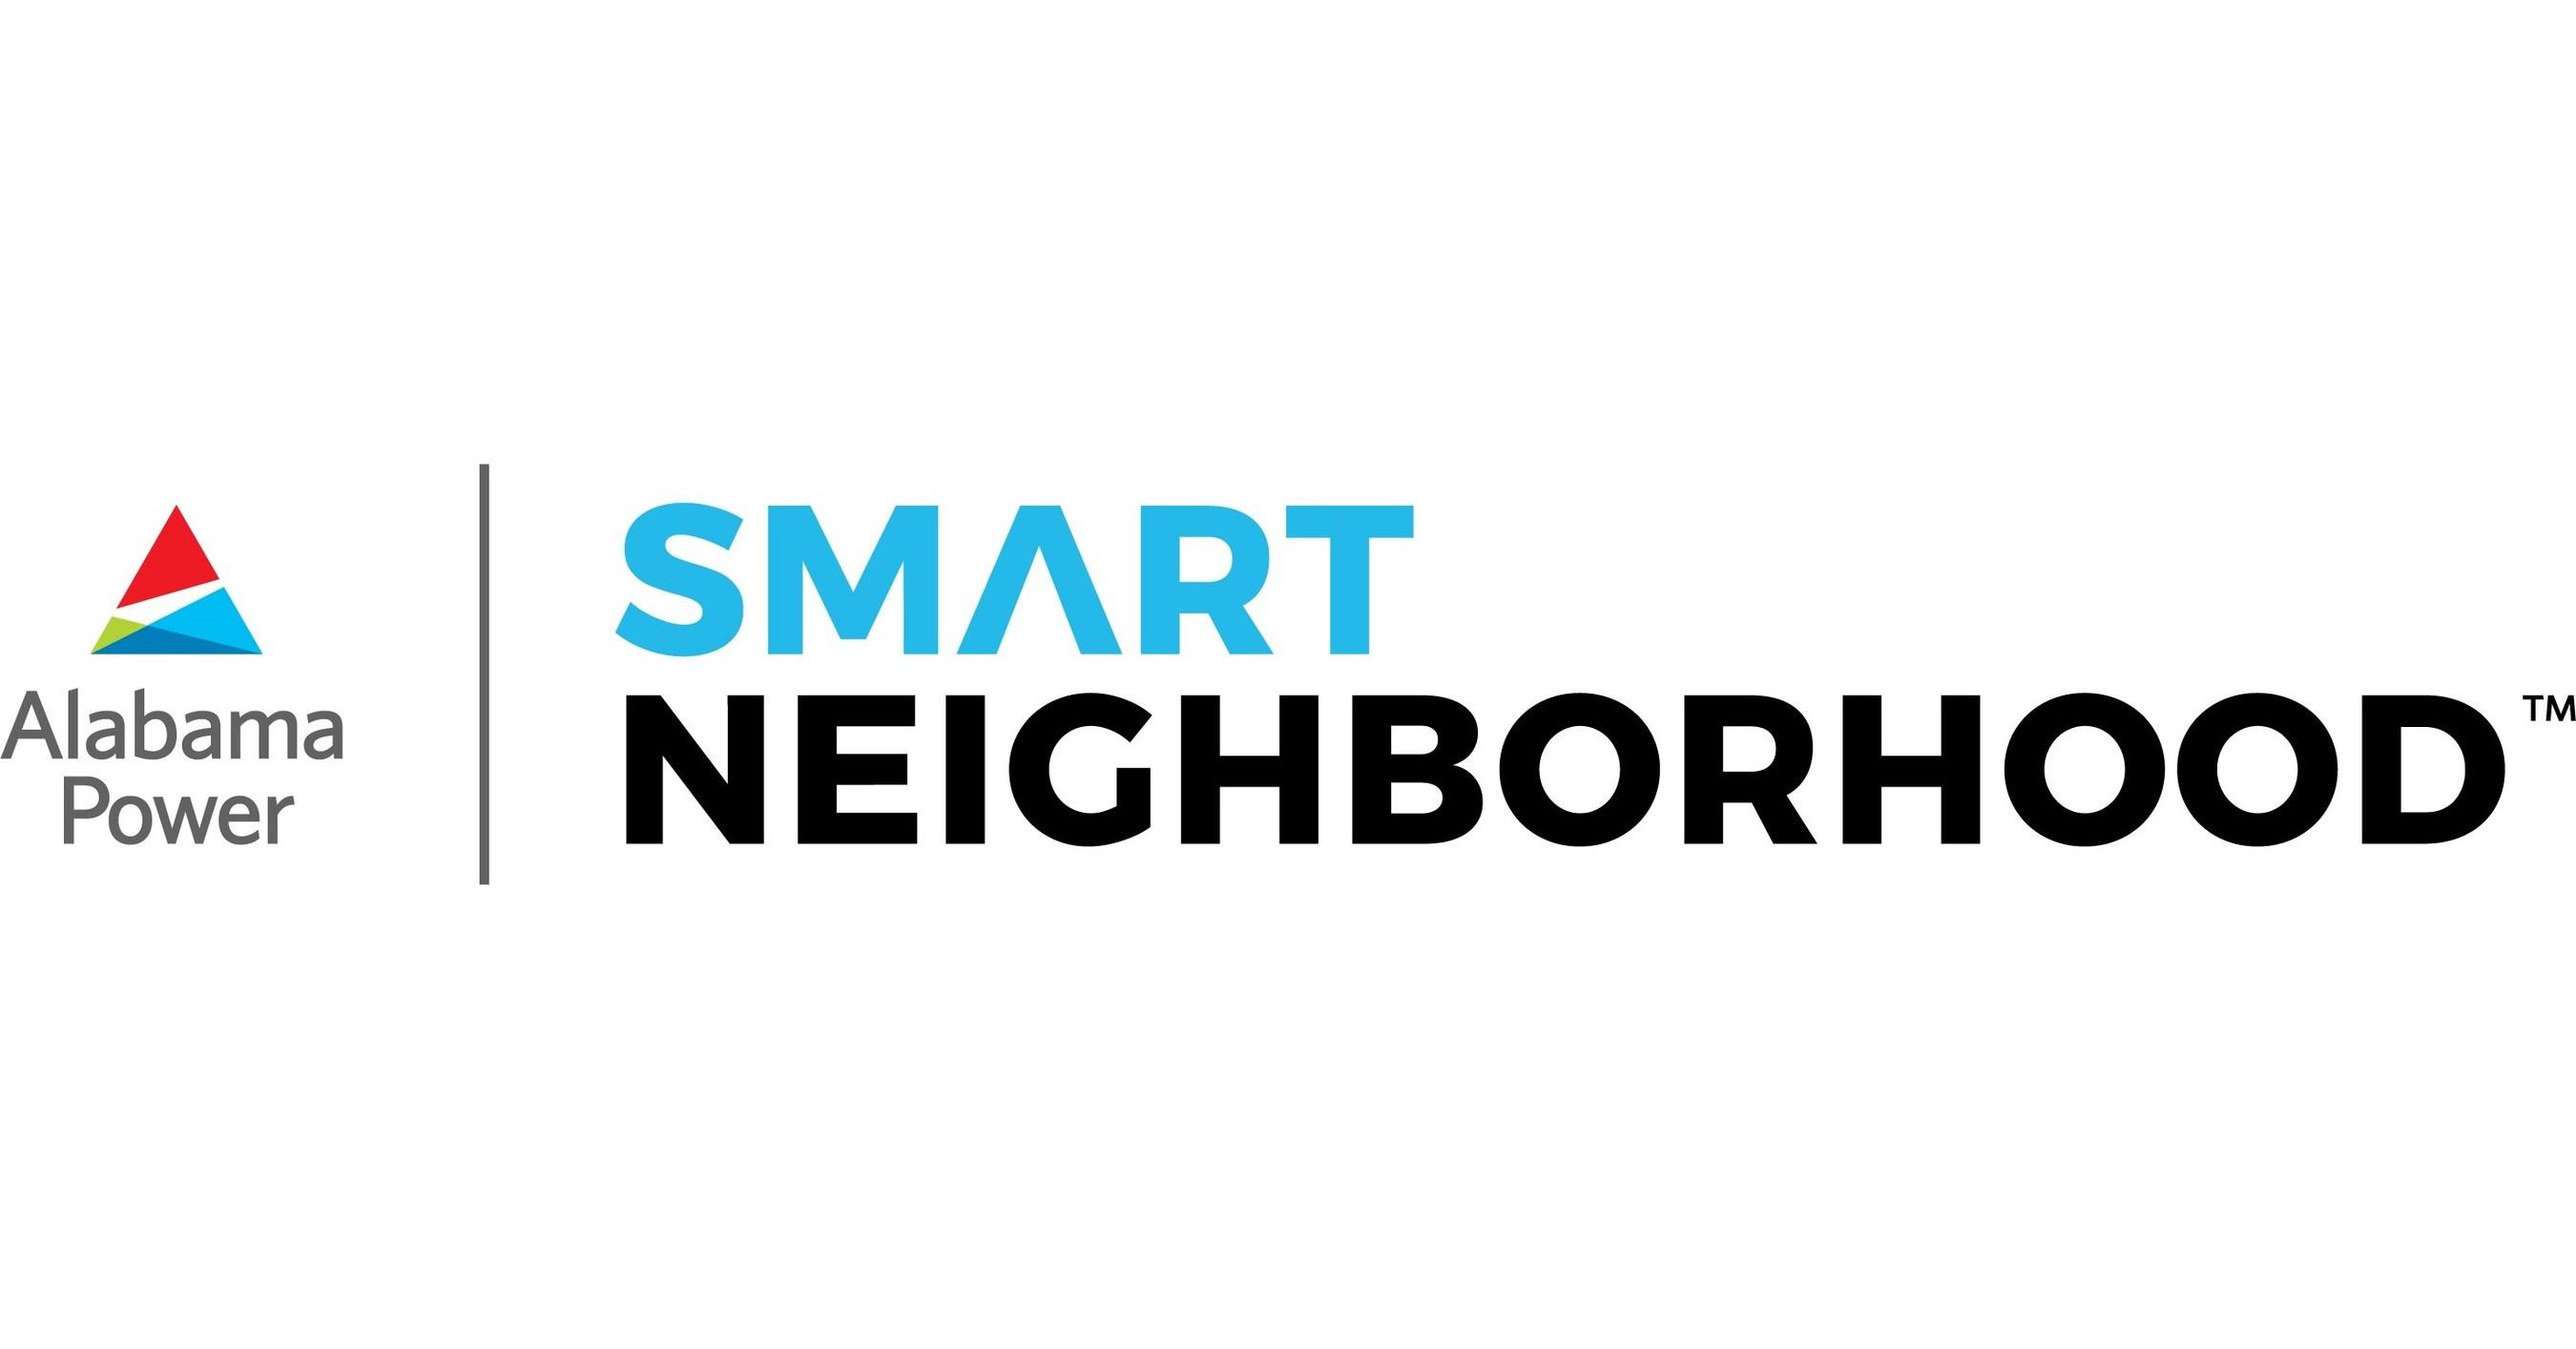 alabama power partners with signature homes to develop smart neighborhood u2122